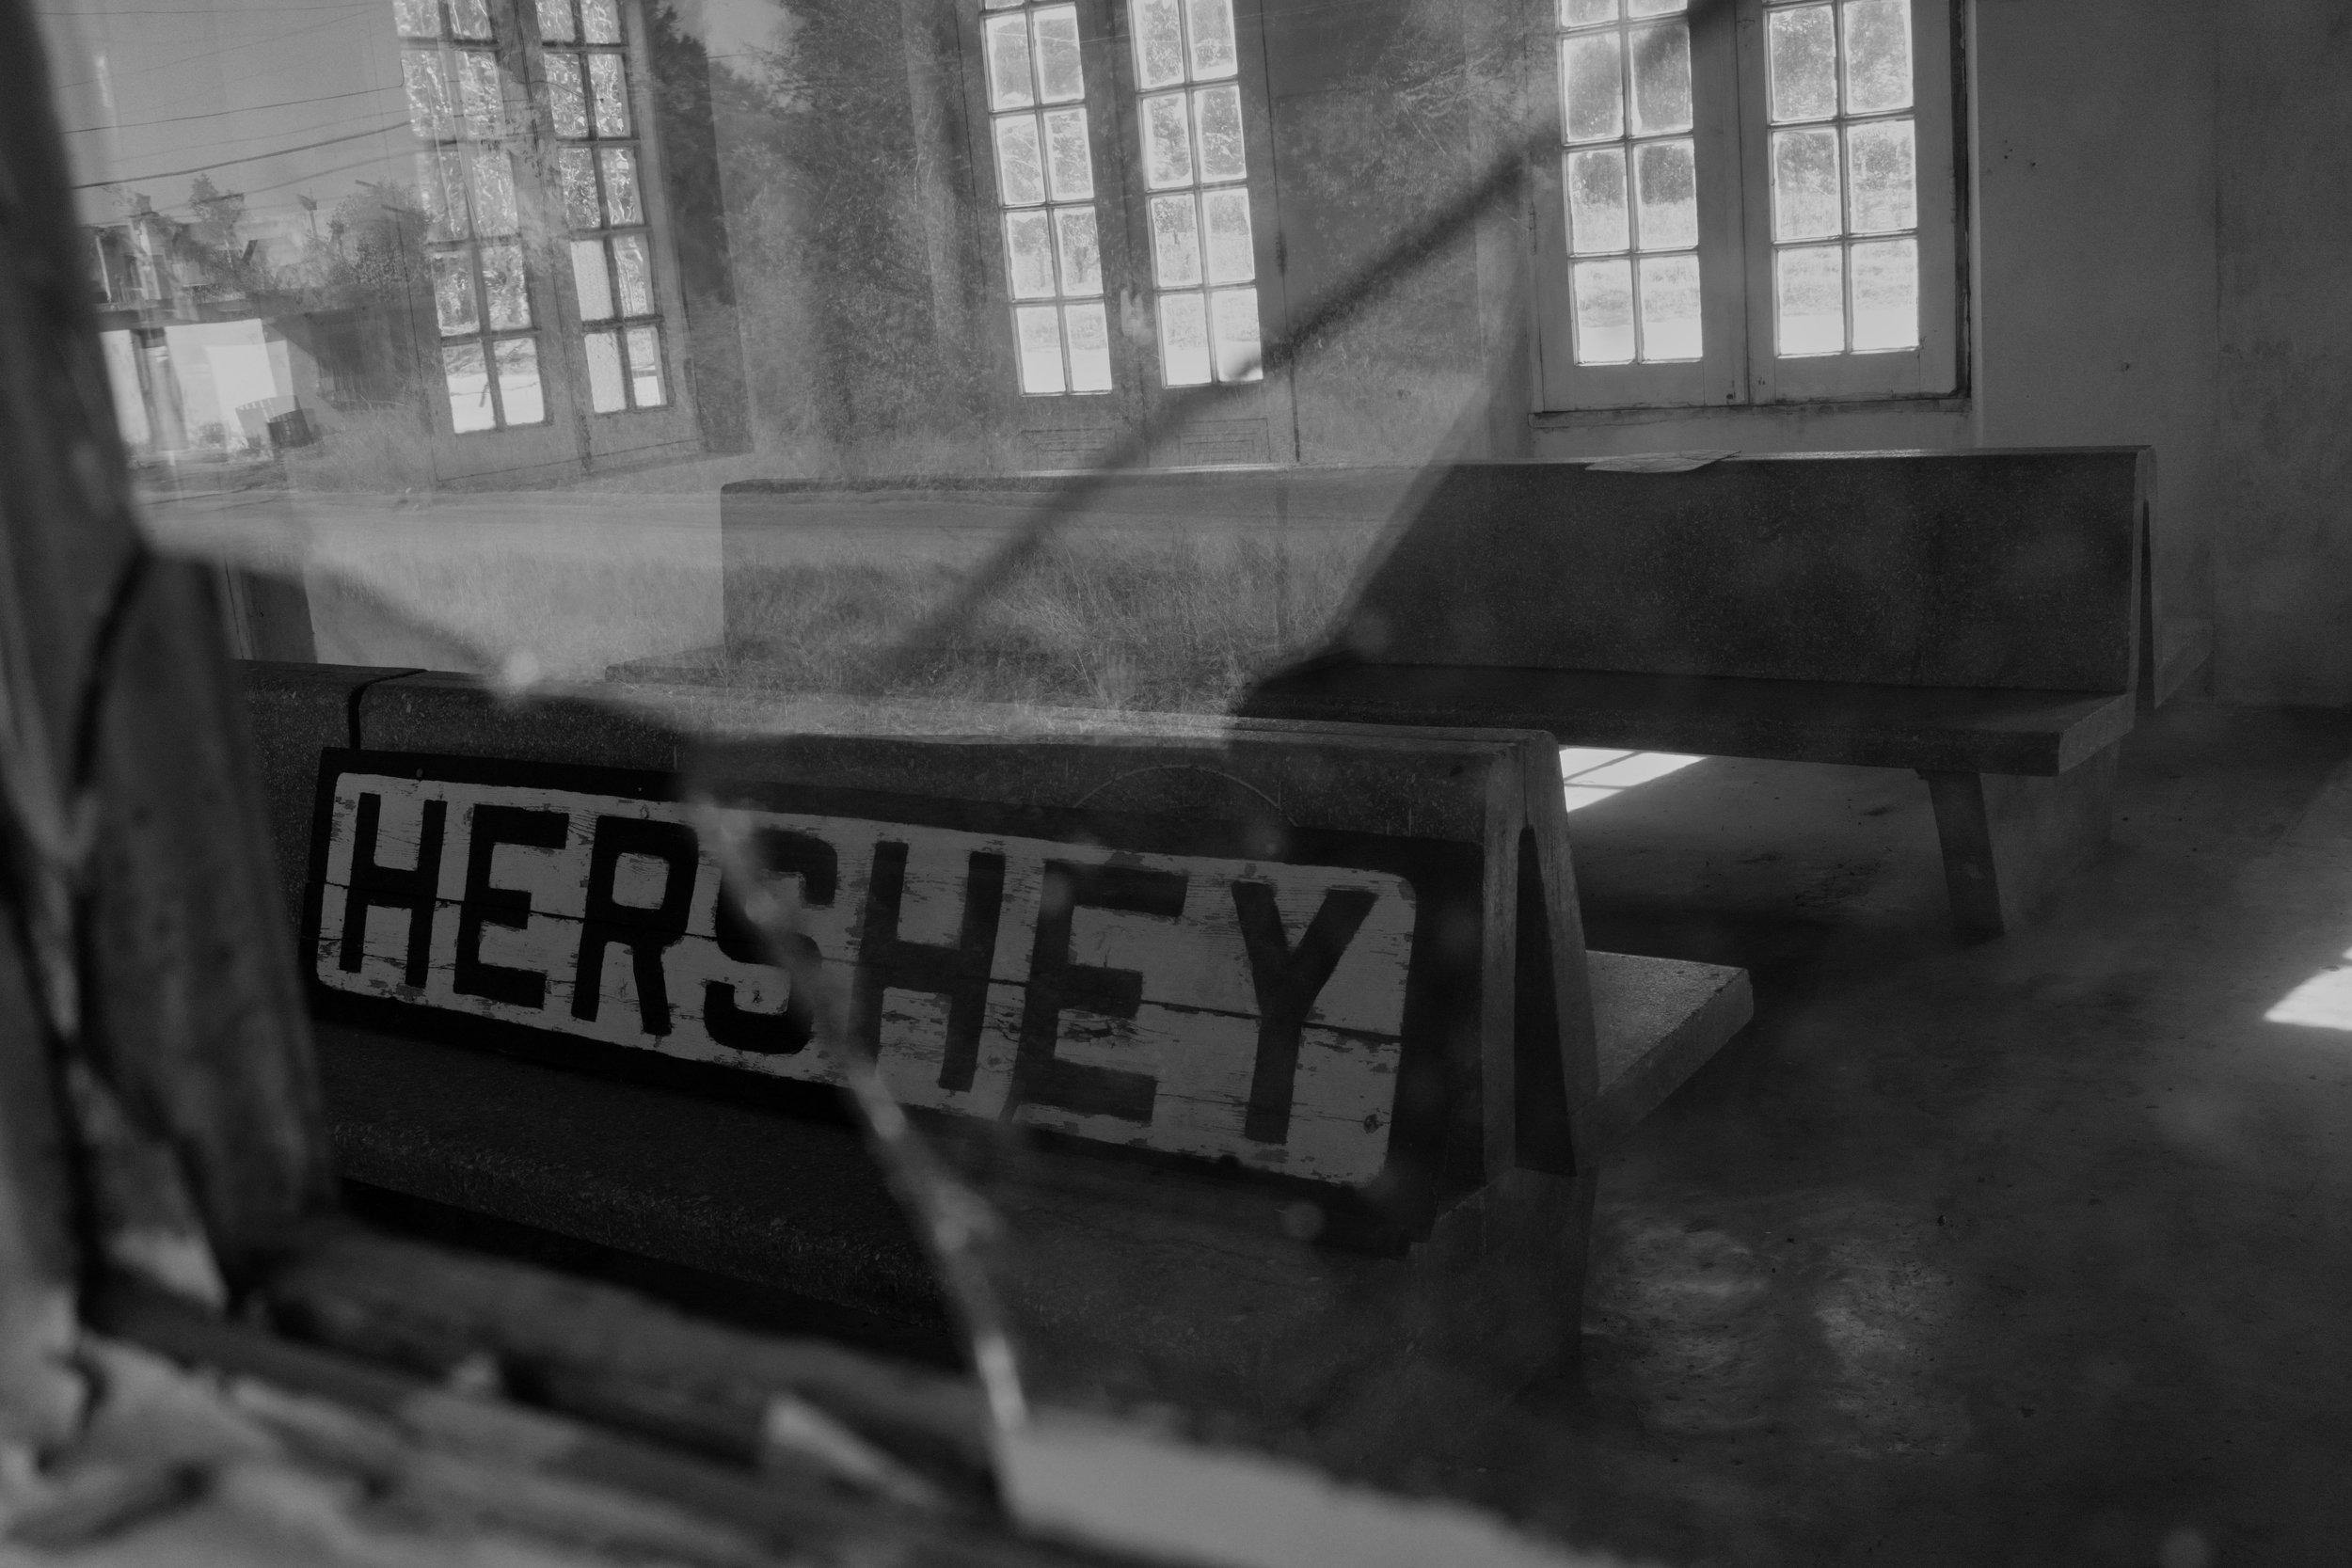 Hershey I Hershey, Cuba Leica SL 35mm f/1.4 FLE Summilux © Keith R. Sbiral, 2018